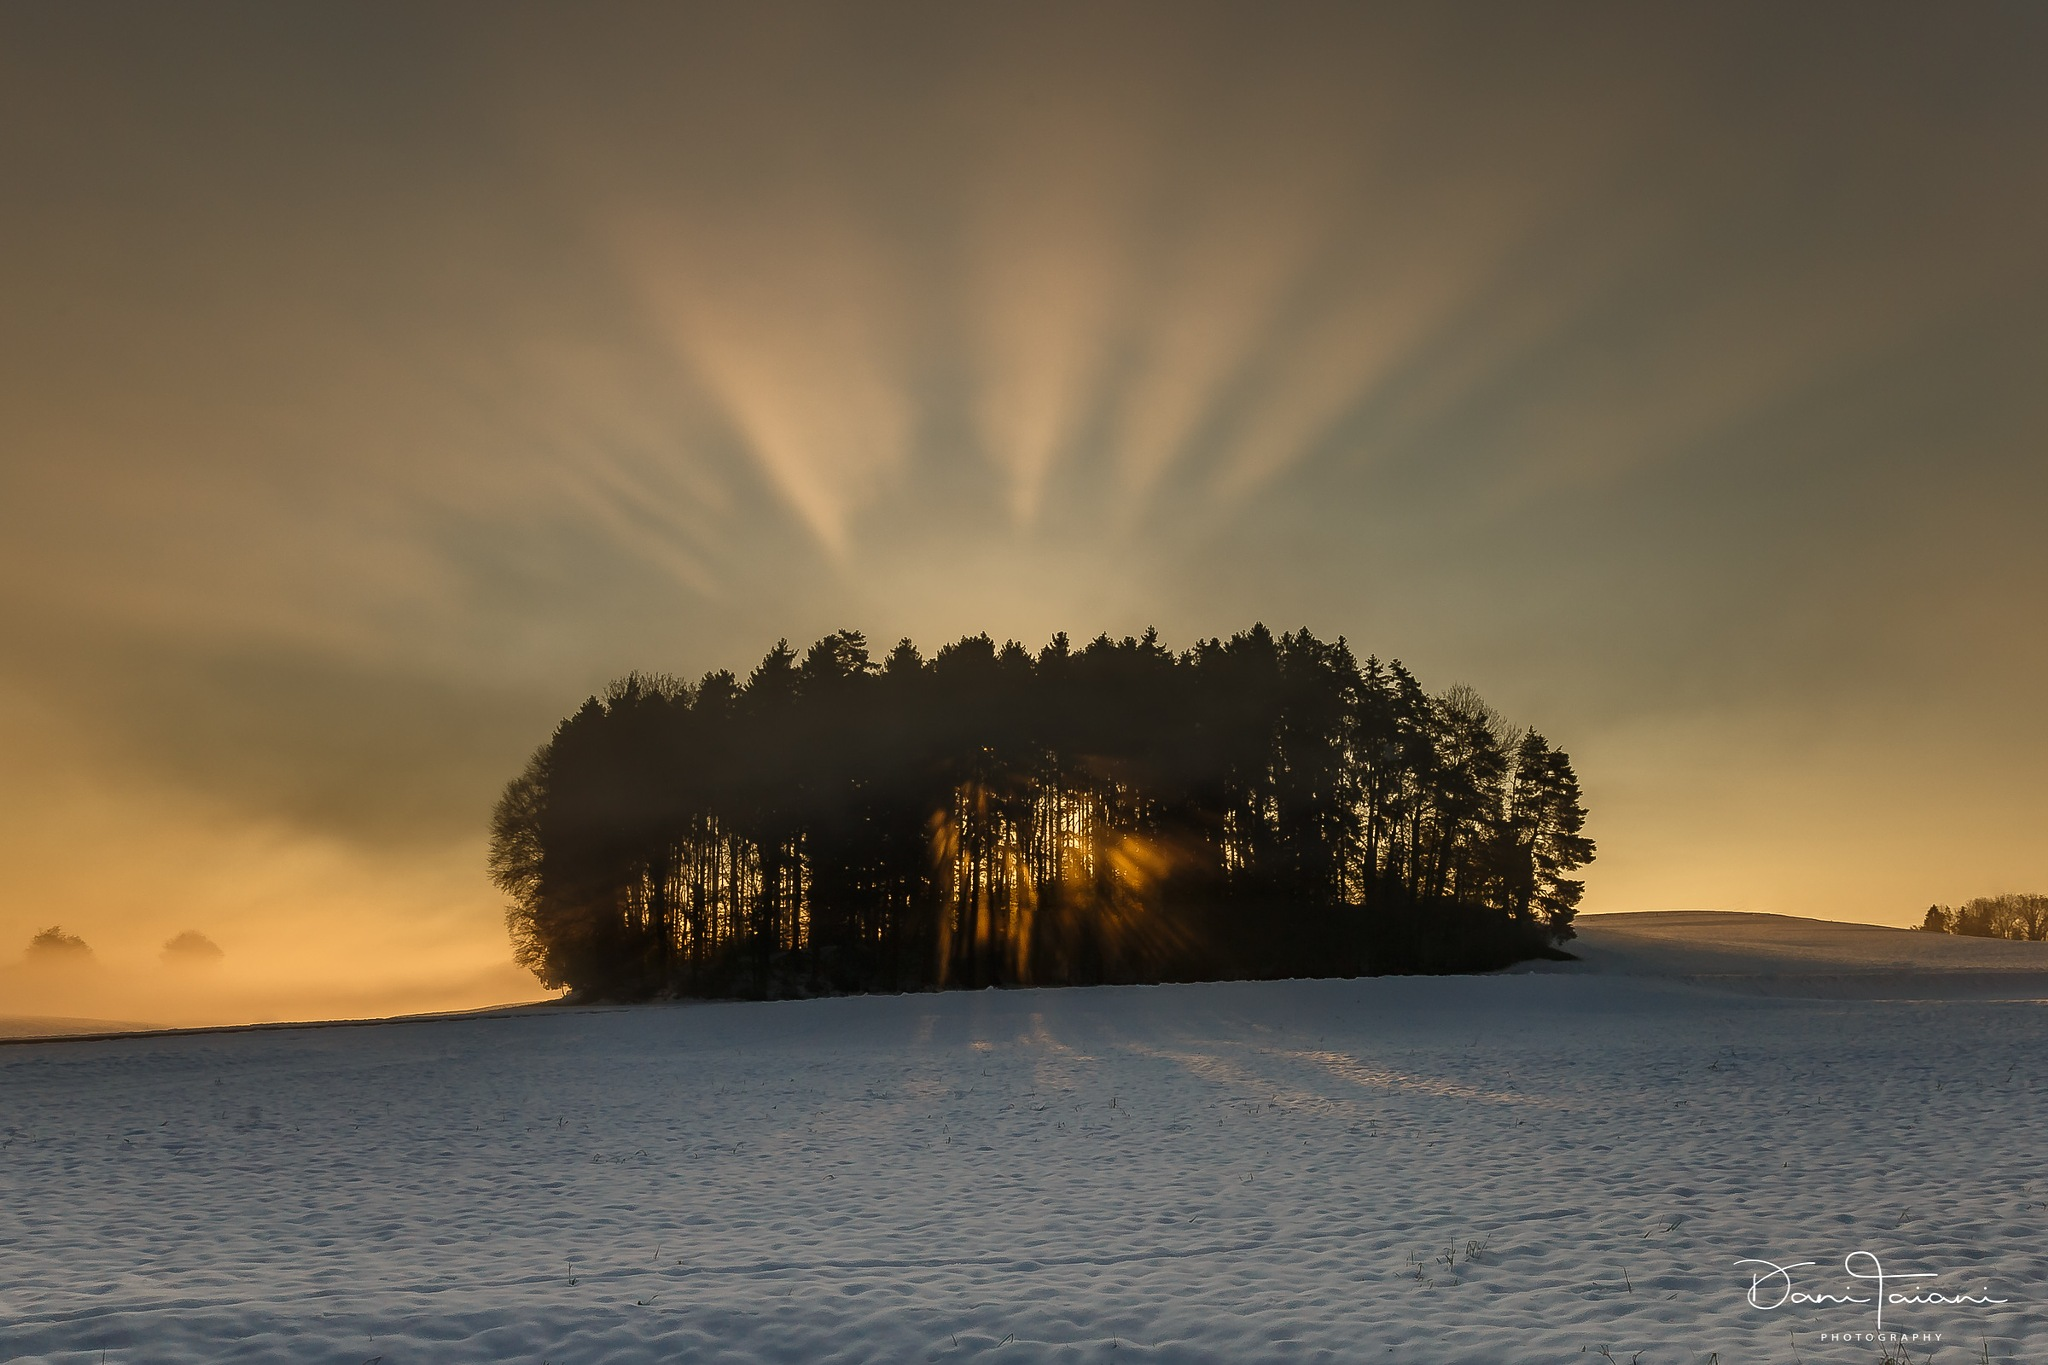 magic forest by Dani Taiani